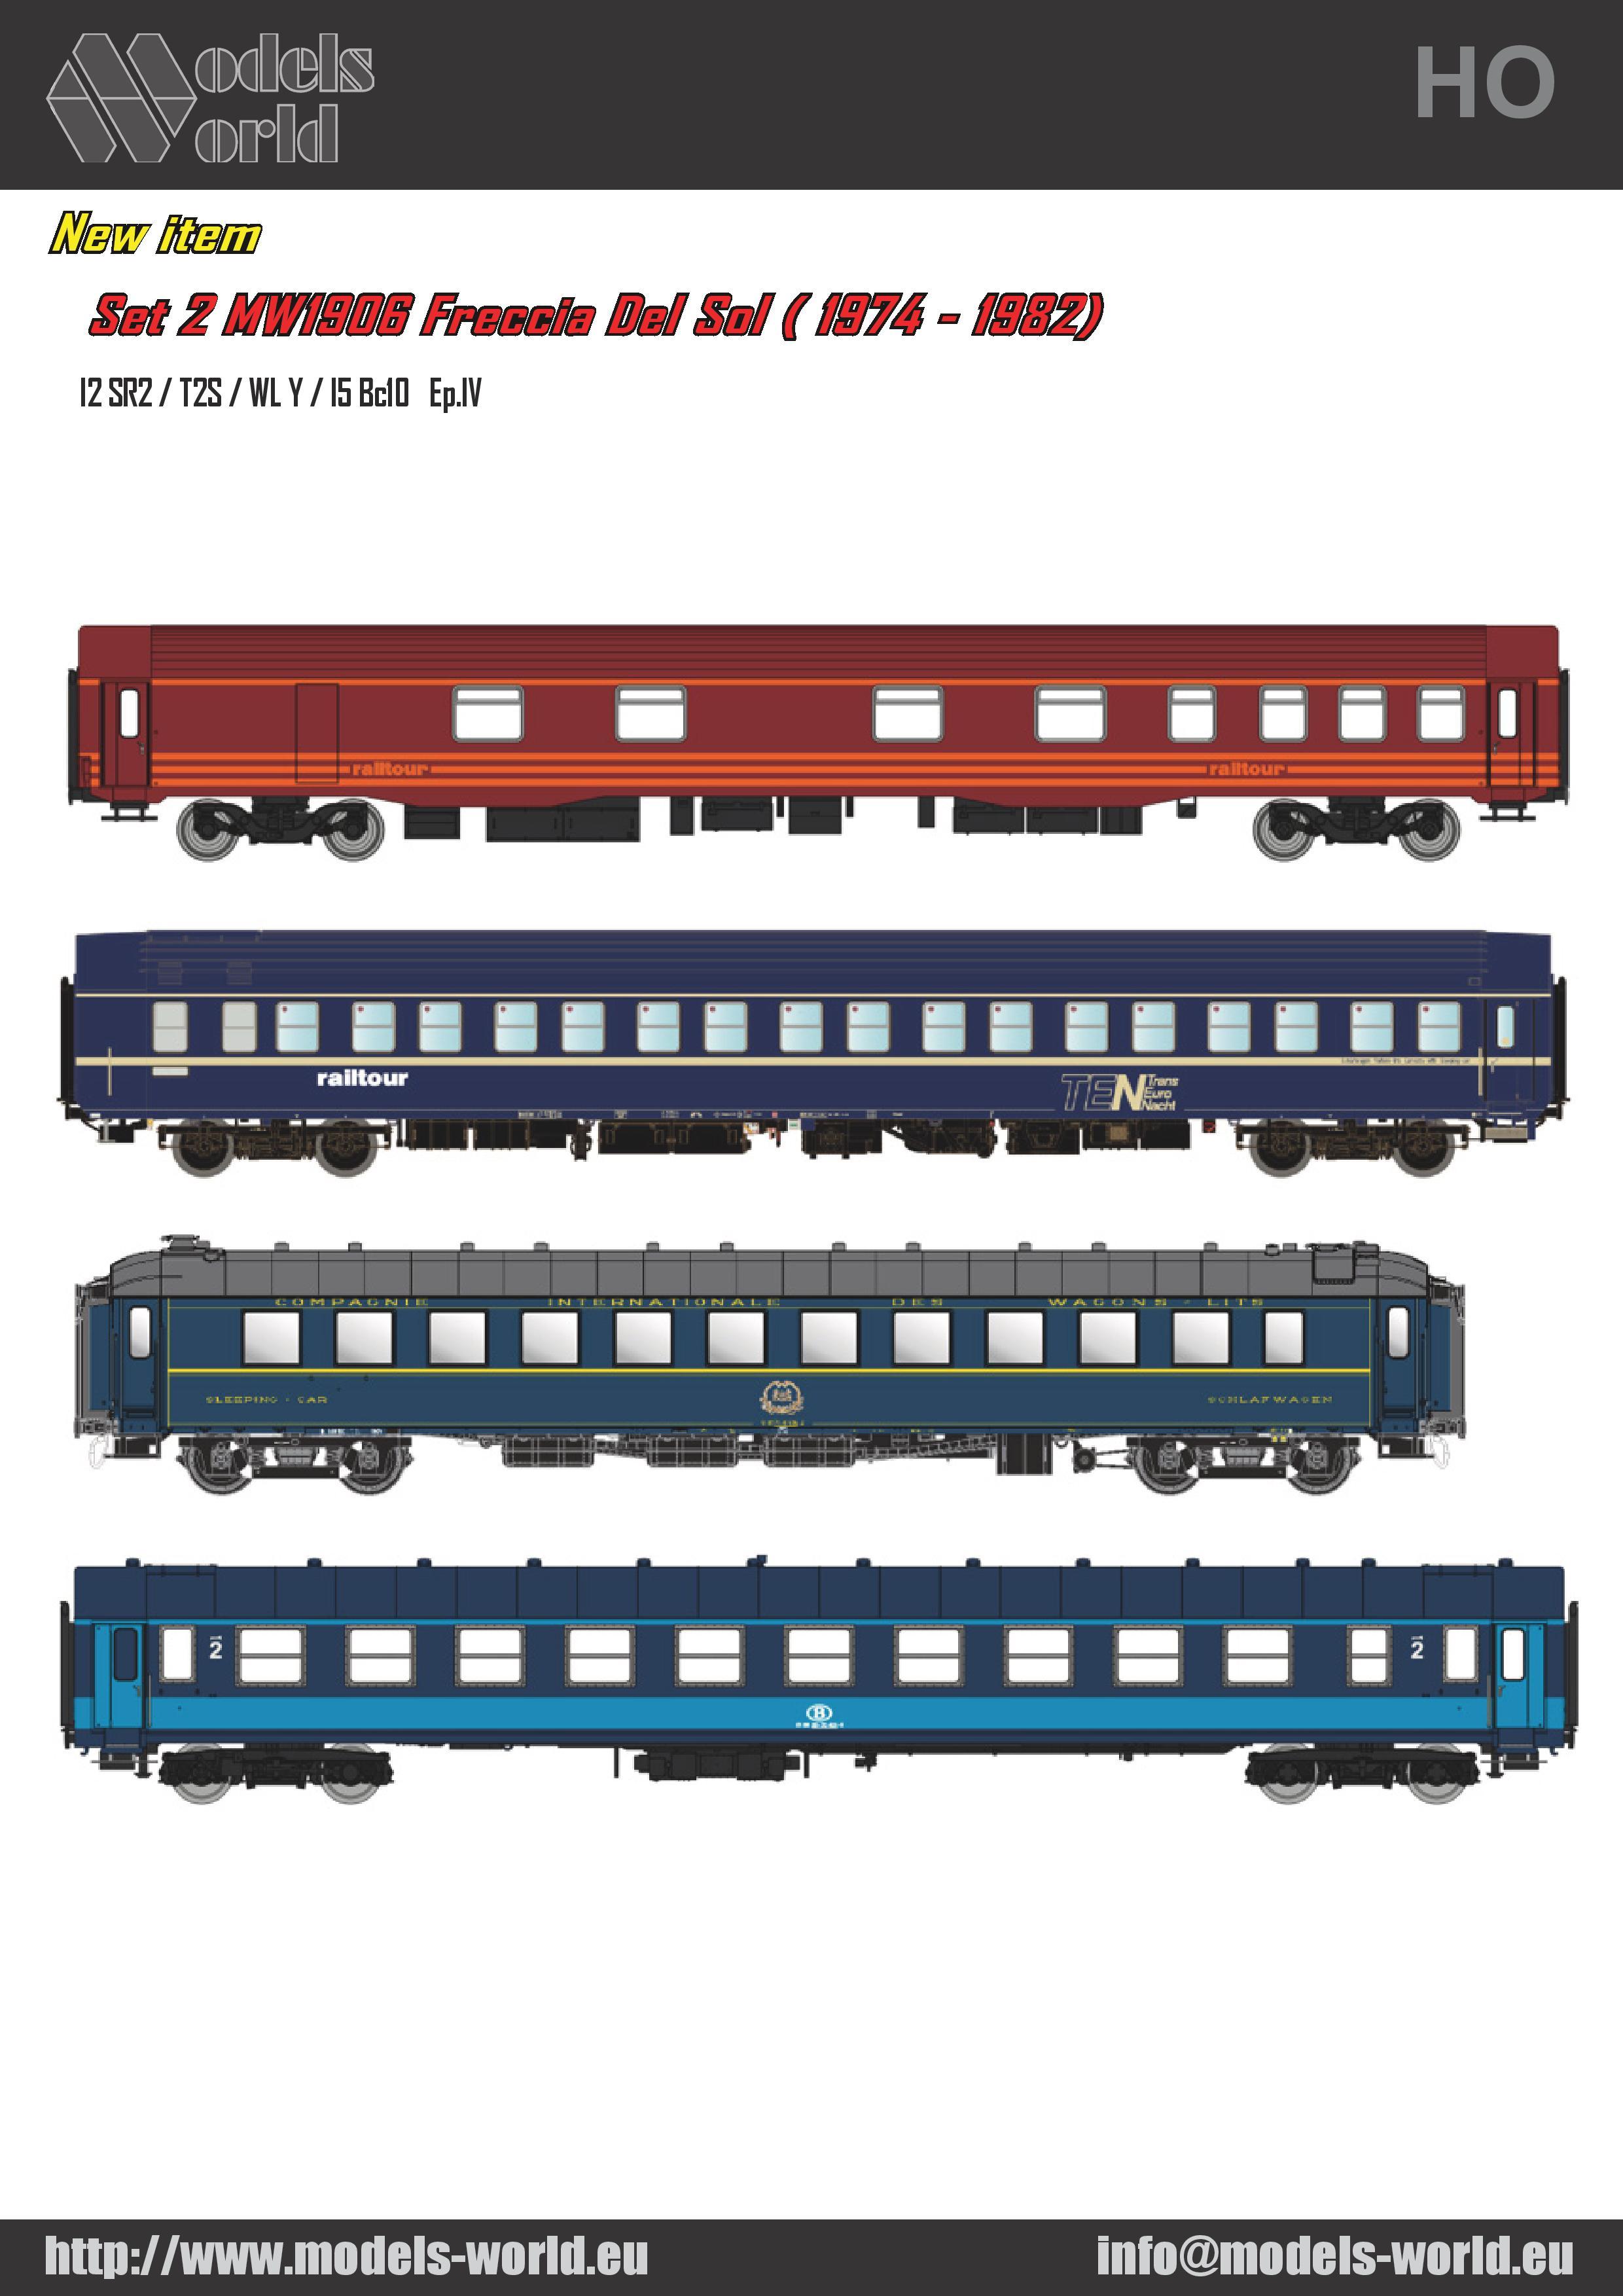 Folder RBe 44 - M6 - Railtour-page-010.jpg